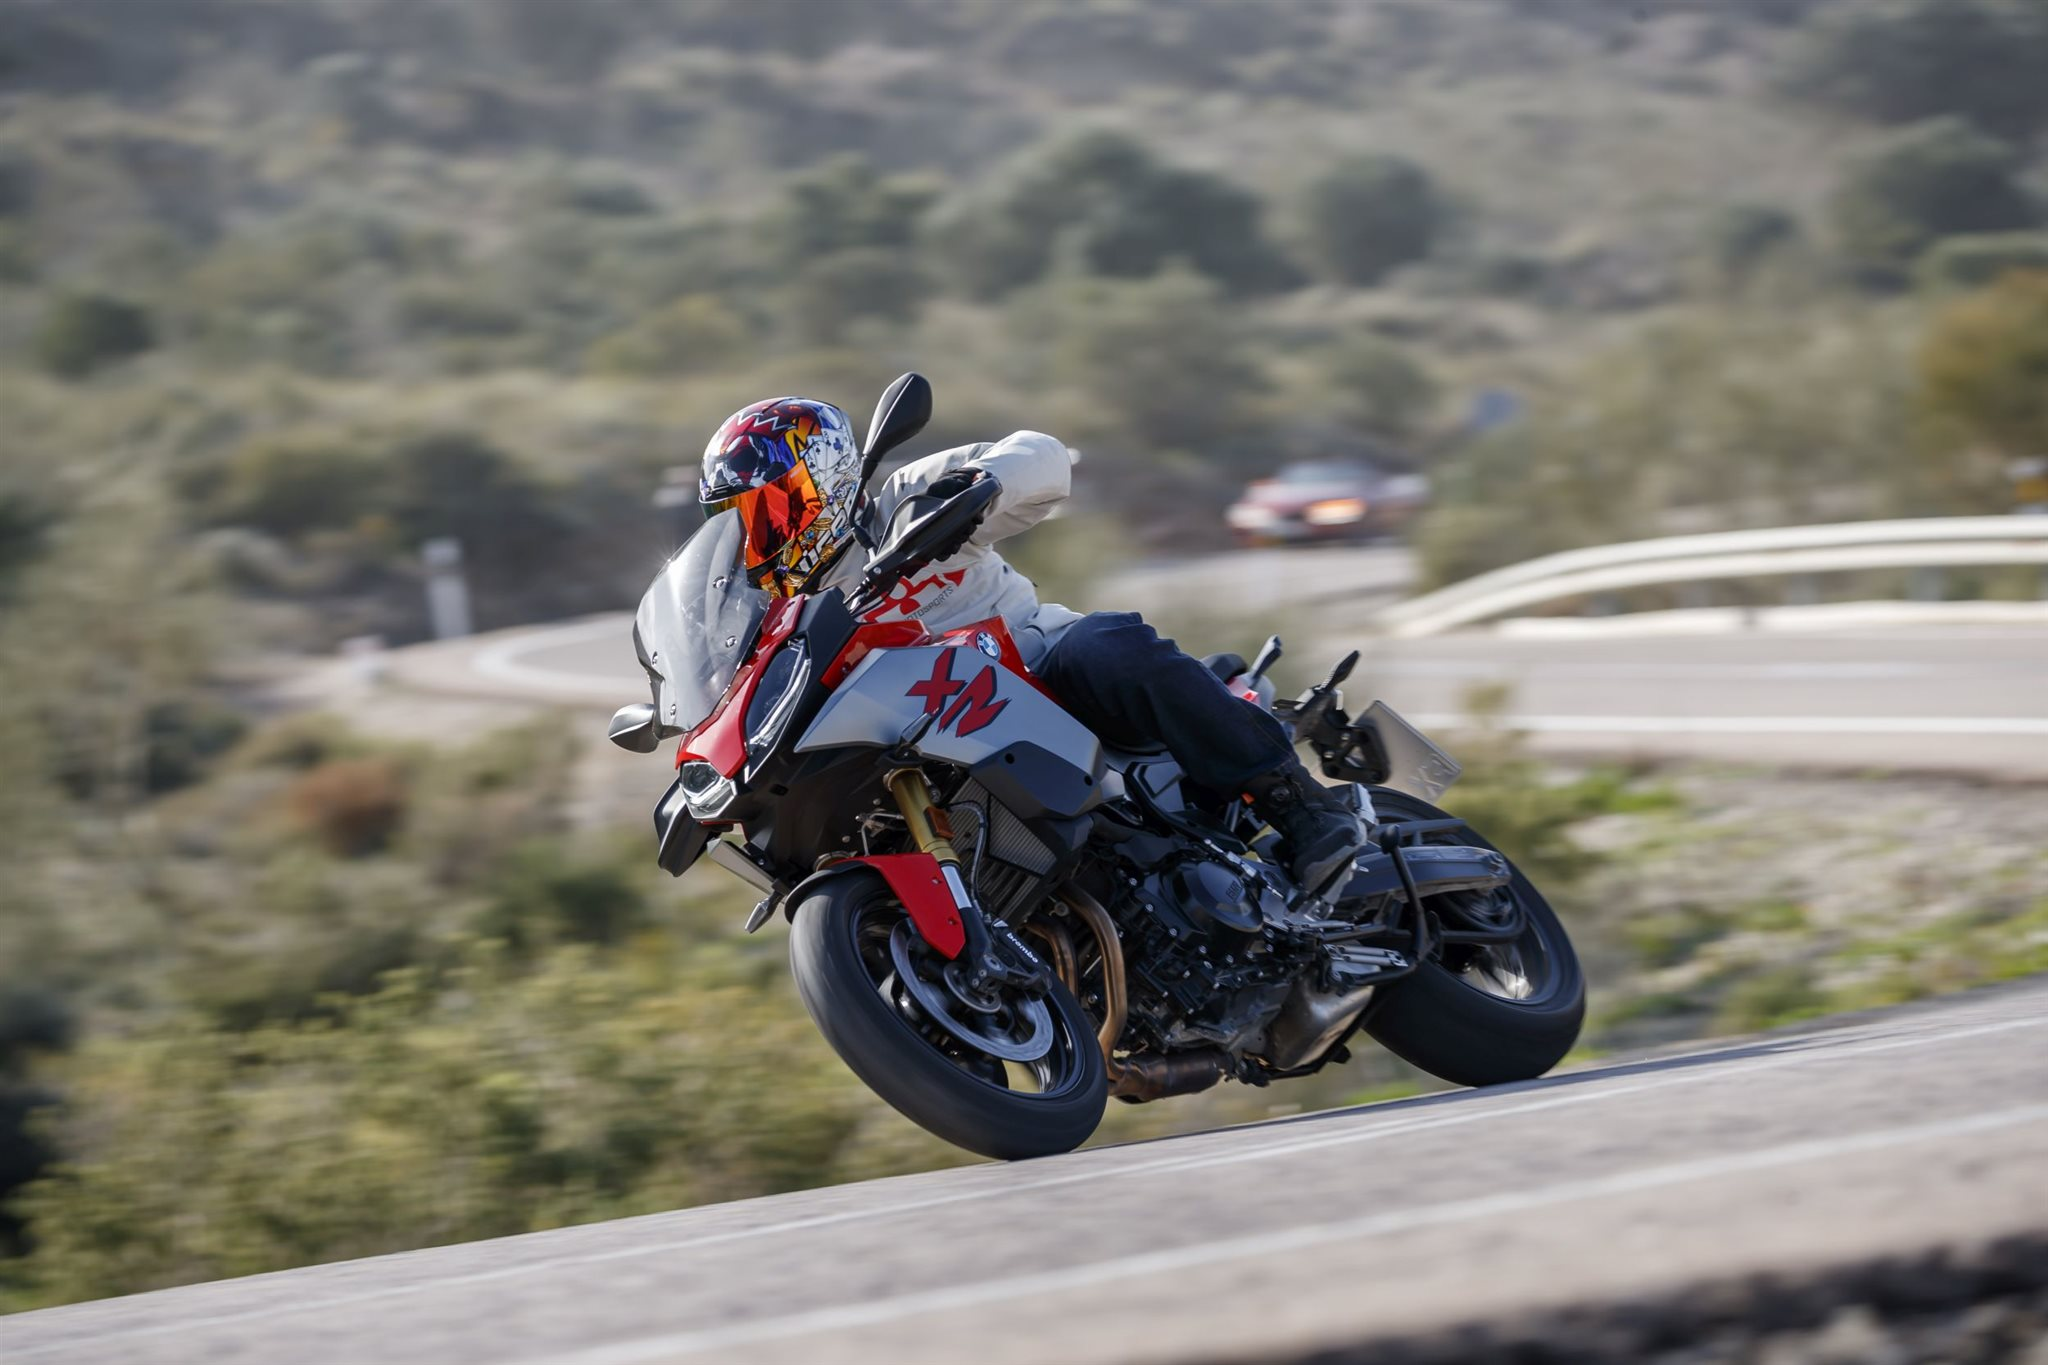 Bmw F 900 Xr Test 2020 Testbericht